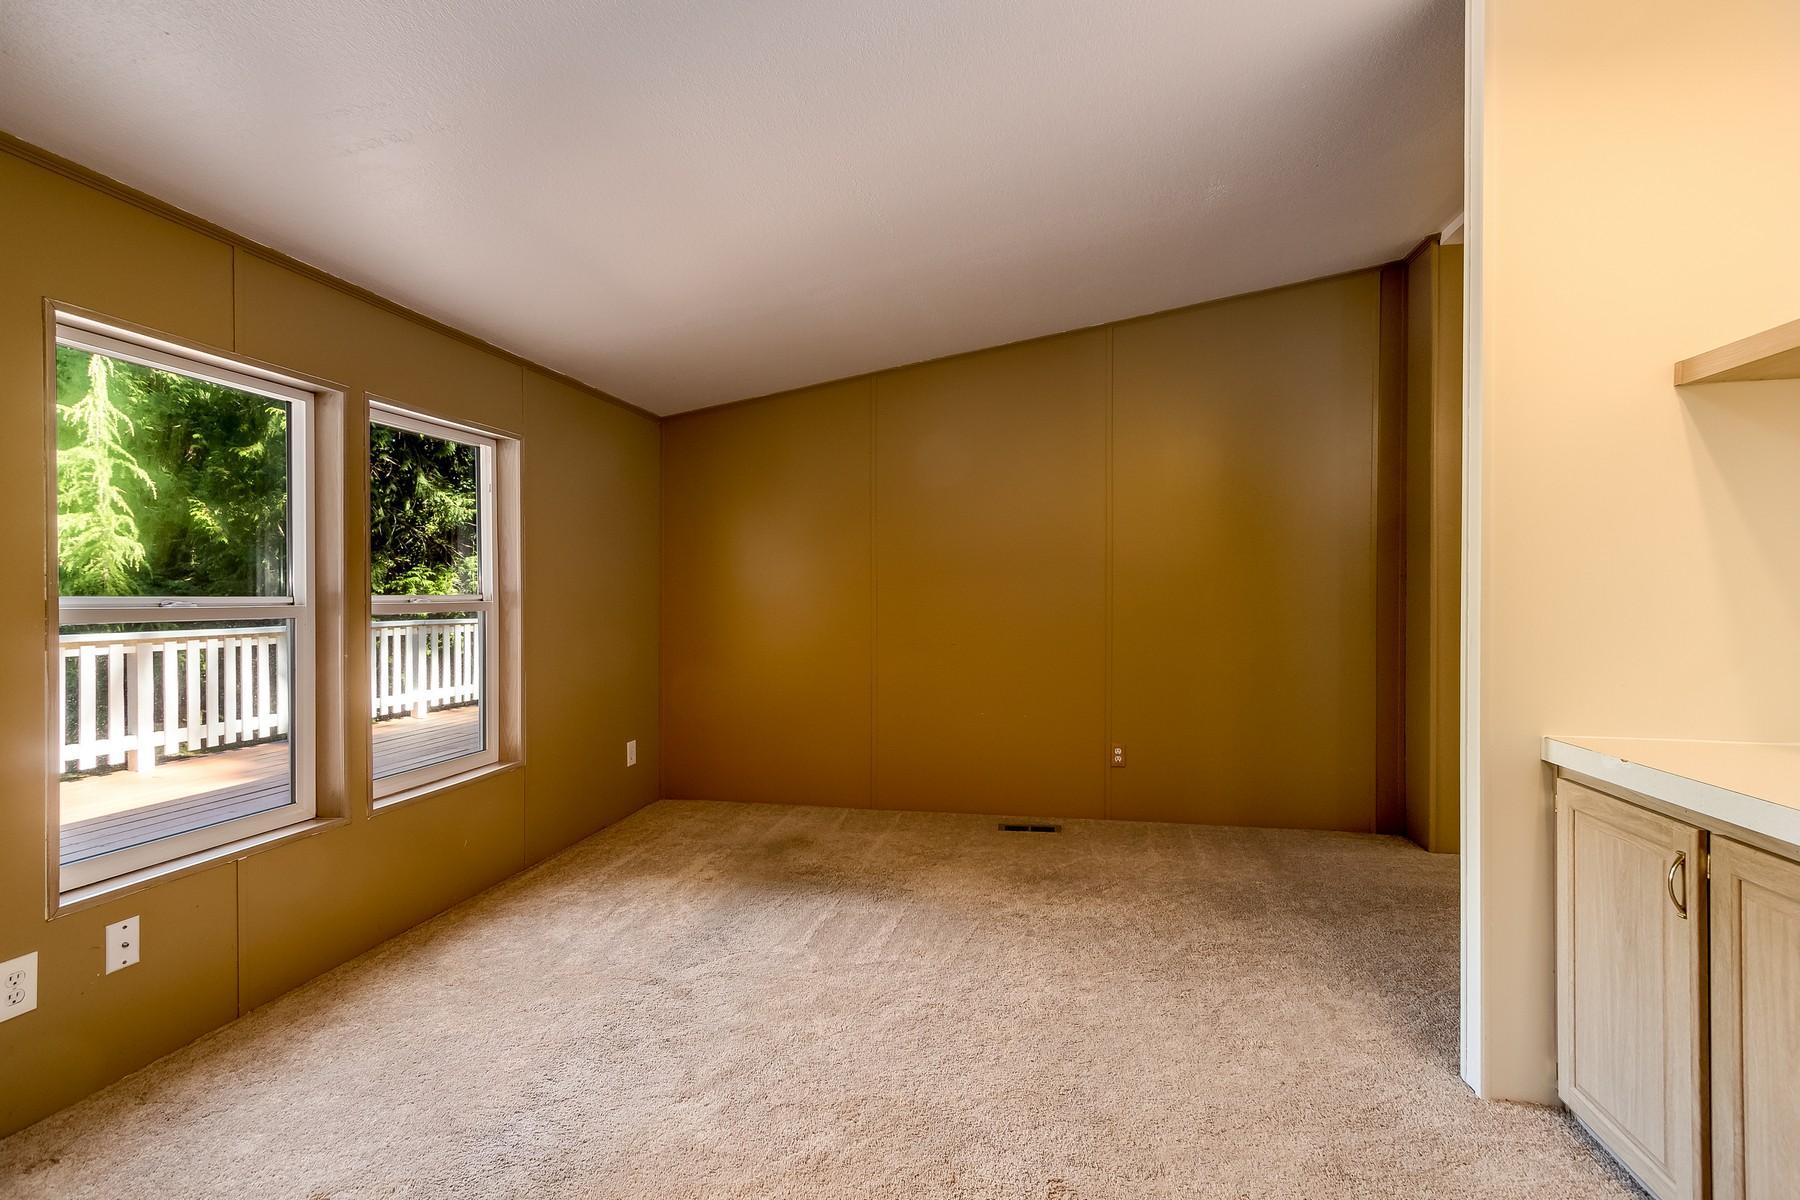 Additional photo for property listing at Affordable Gem in Fletcher Bay 8480 NE Hansen Rd Bainbridge Island, Washington 98110 Estados Unidos